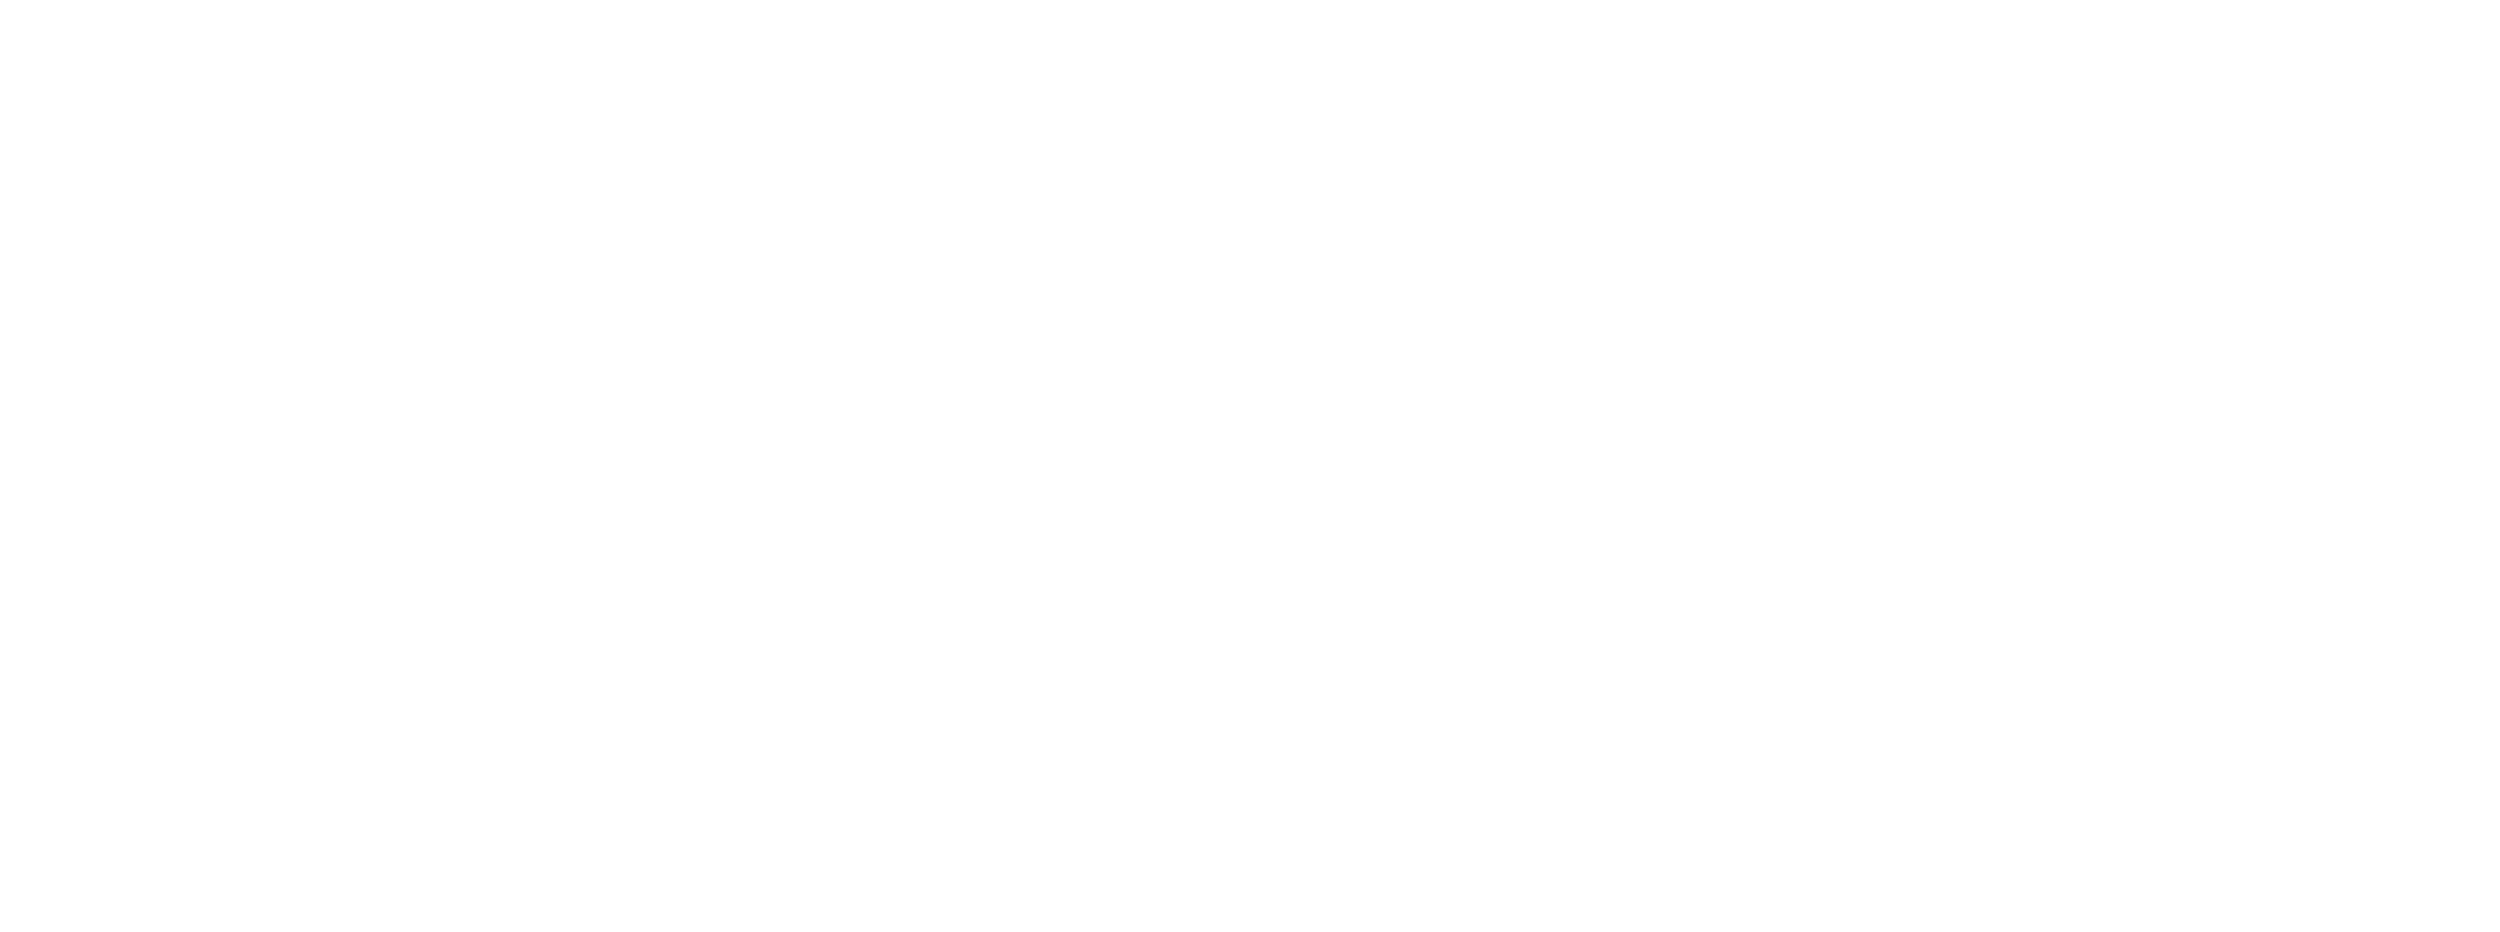 Hallmark_Channel_logo_logotype.png